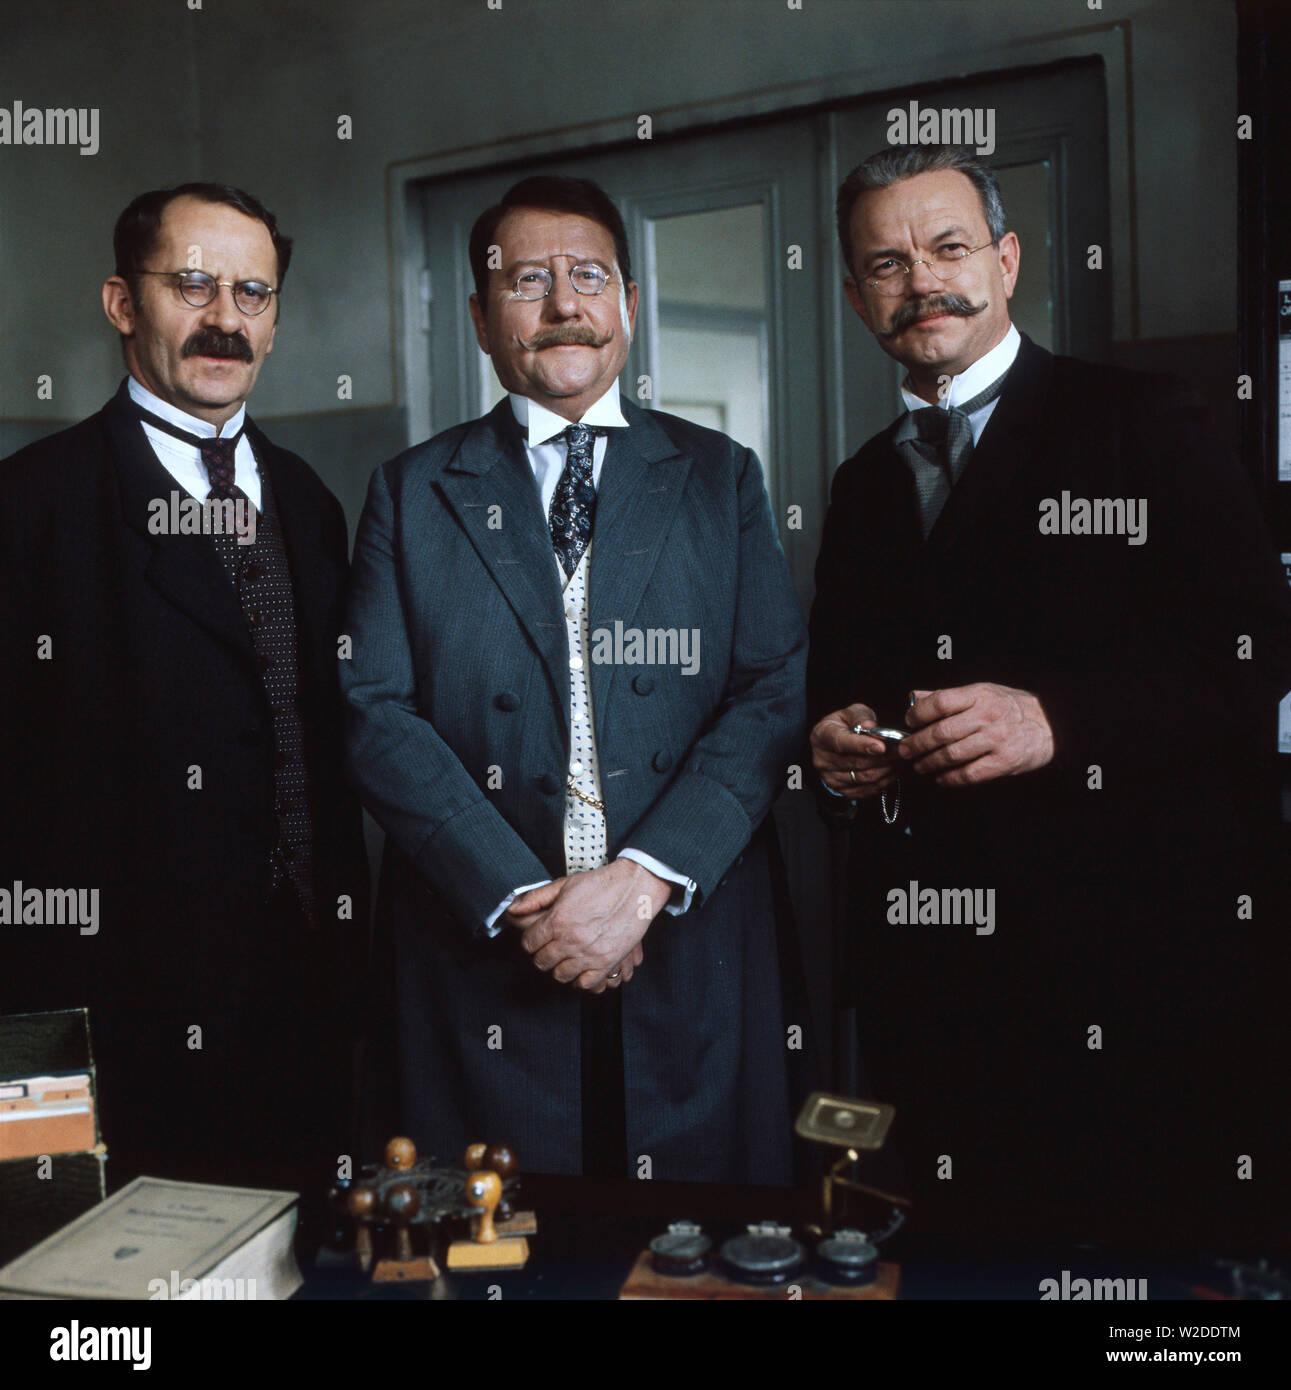 Löwengrube, Fernsehserie, Deutschland 1989 - 1992, Familienserie, Kriminalserie, Darsteller: Fred Stillkrauth, Gerd Fritz, Jörg Hube - Stock Image